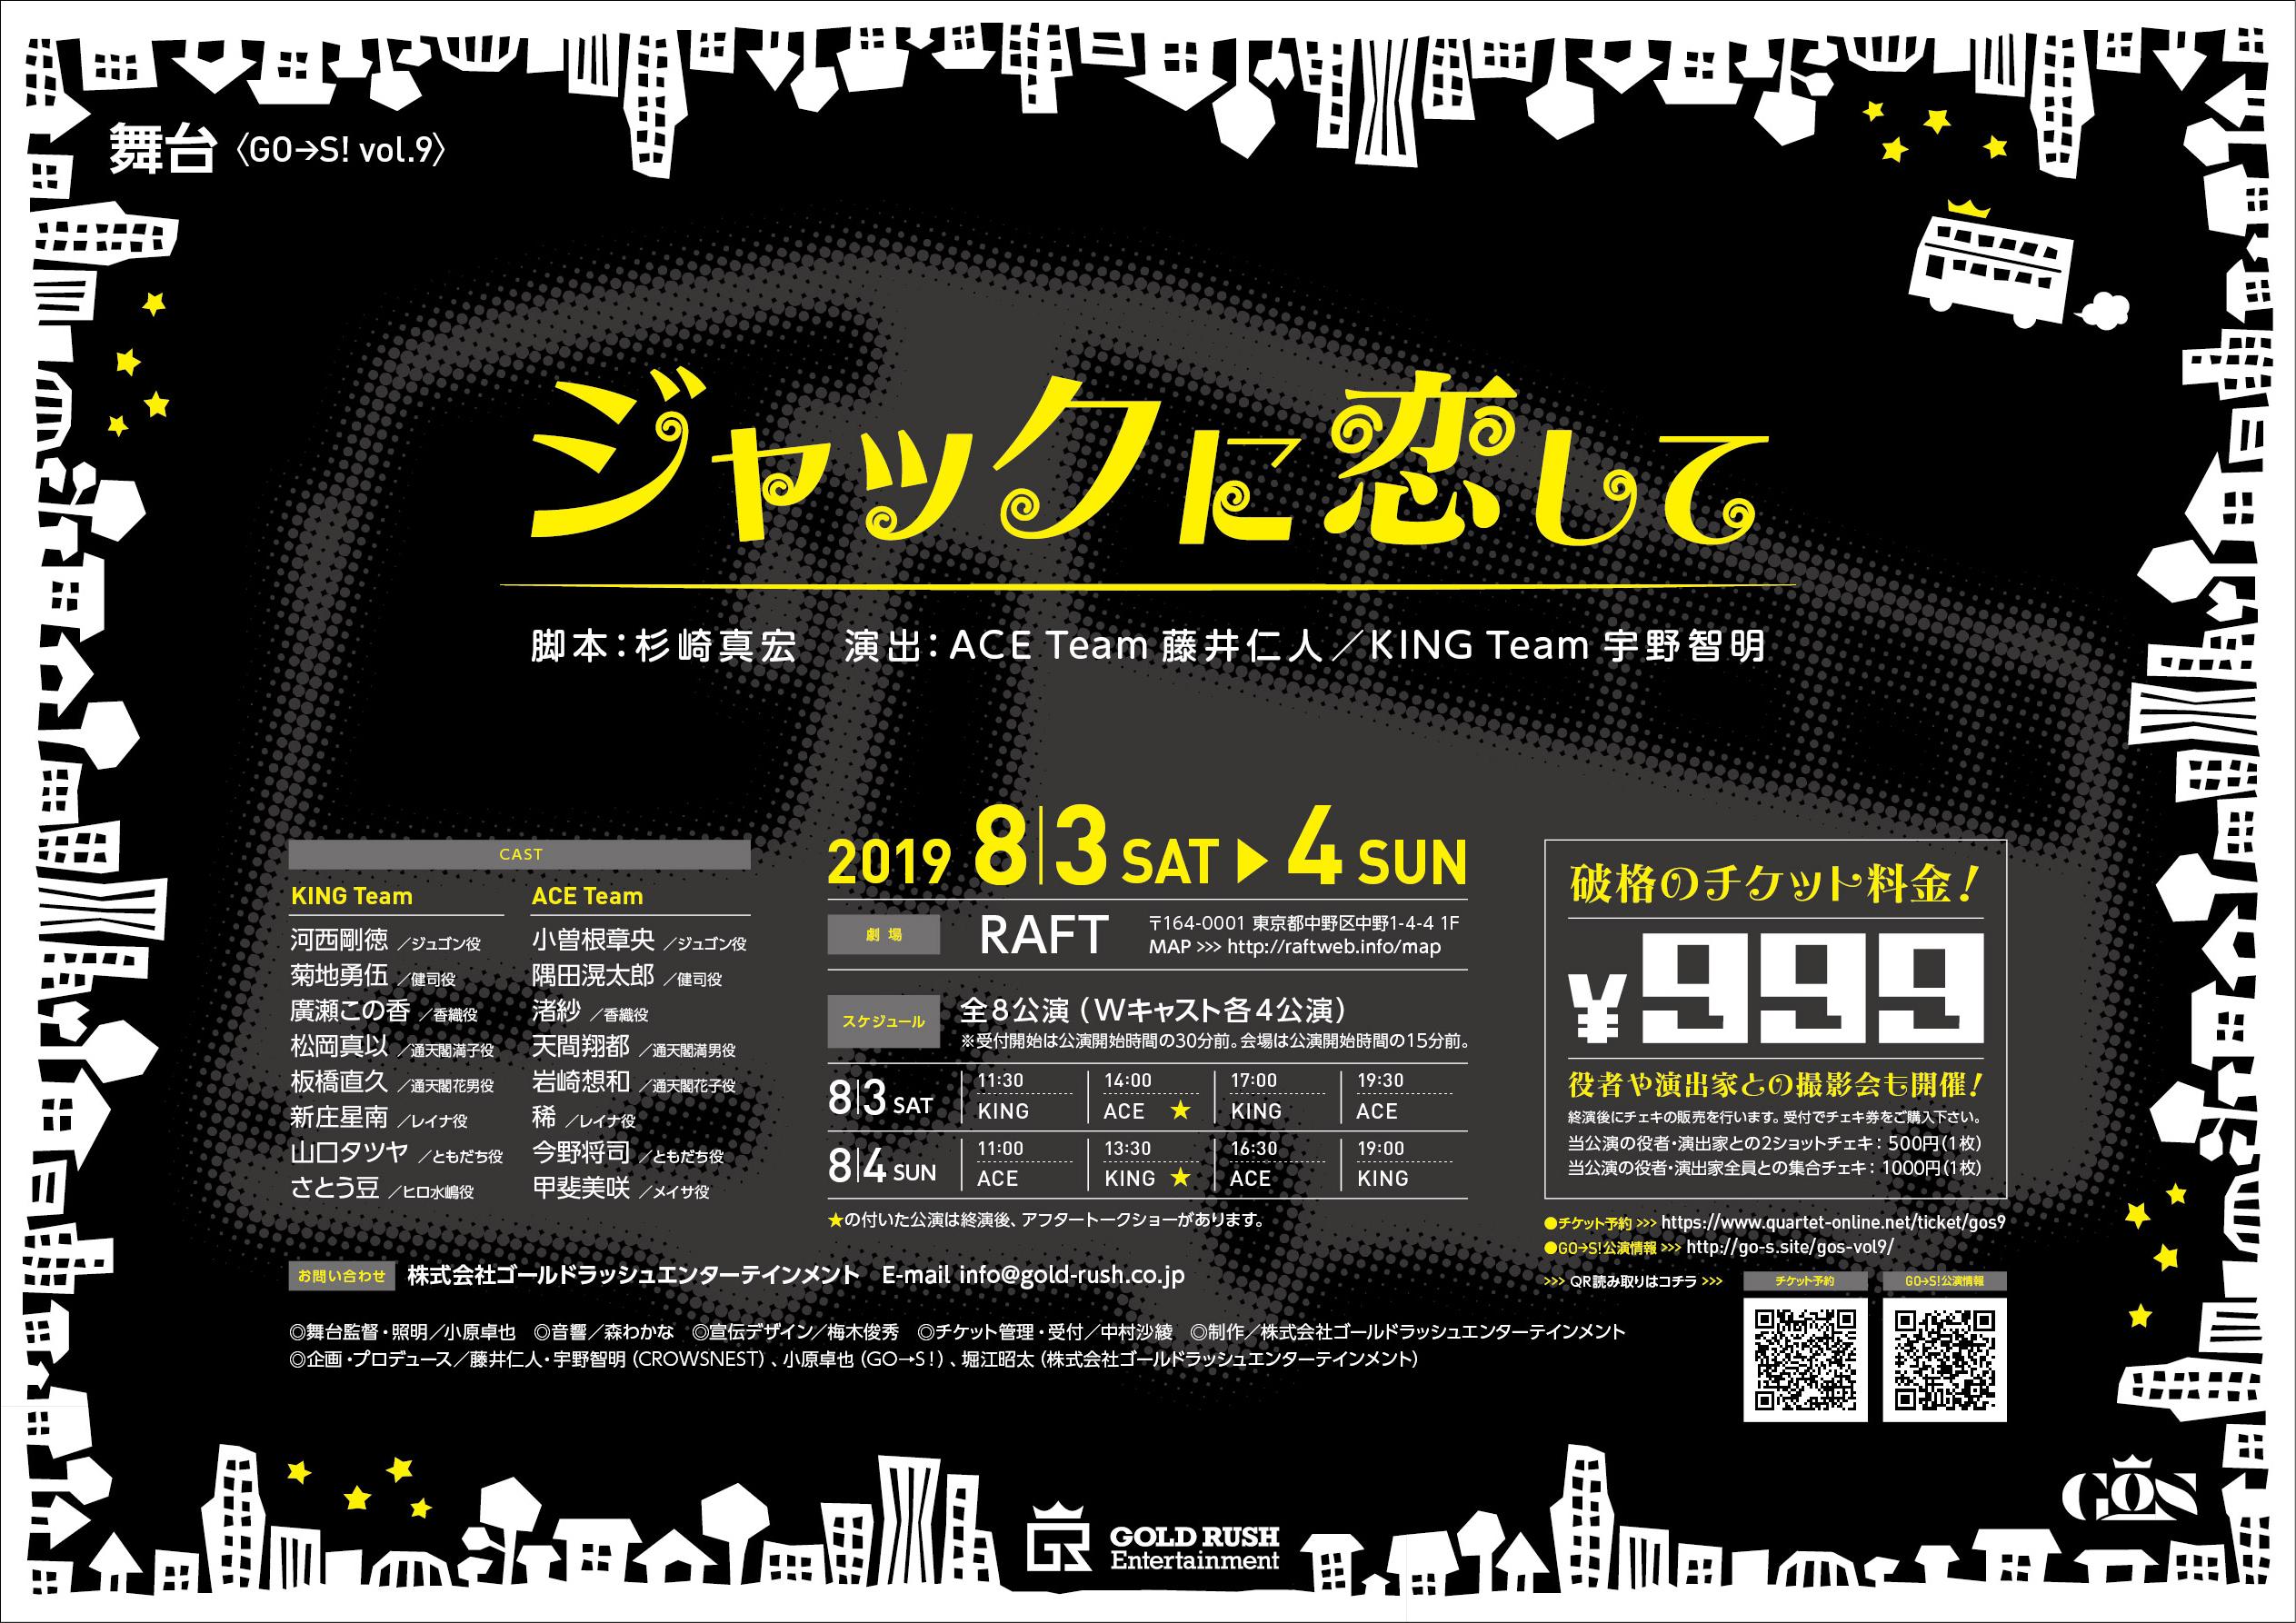 Go-s_vol9_公演チラシ0617s